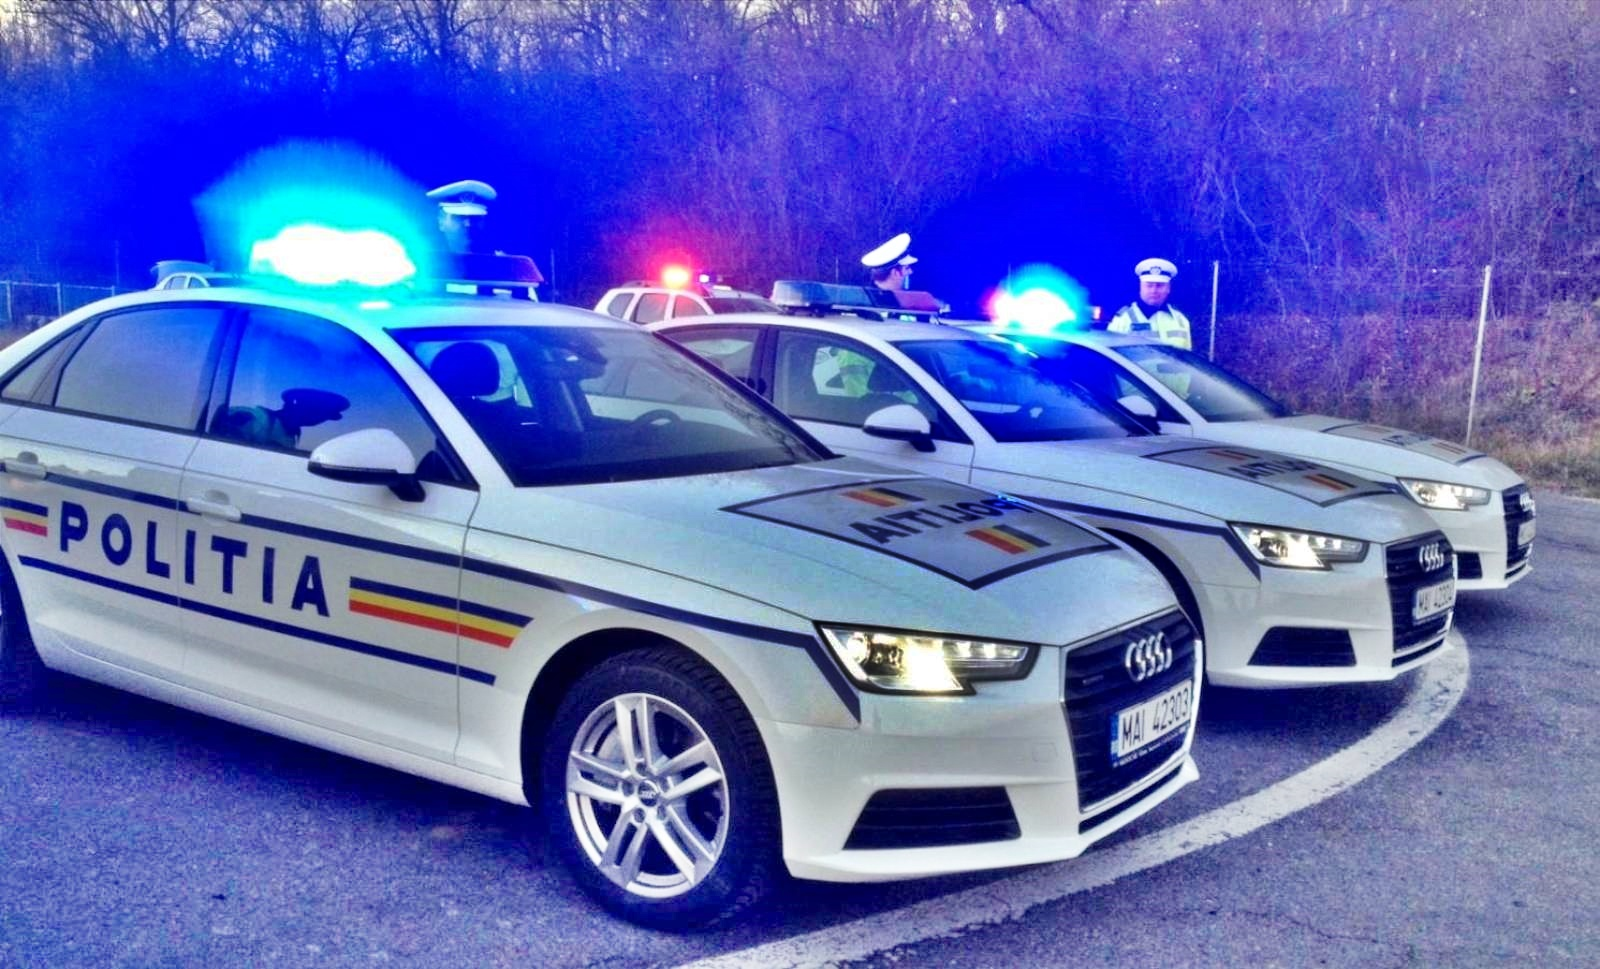 Politia Romana avertisment transport droguri romania